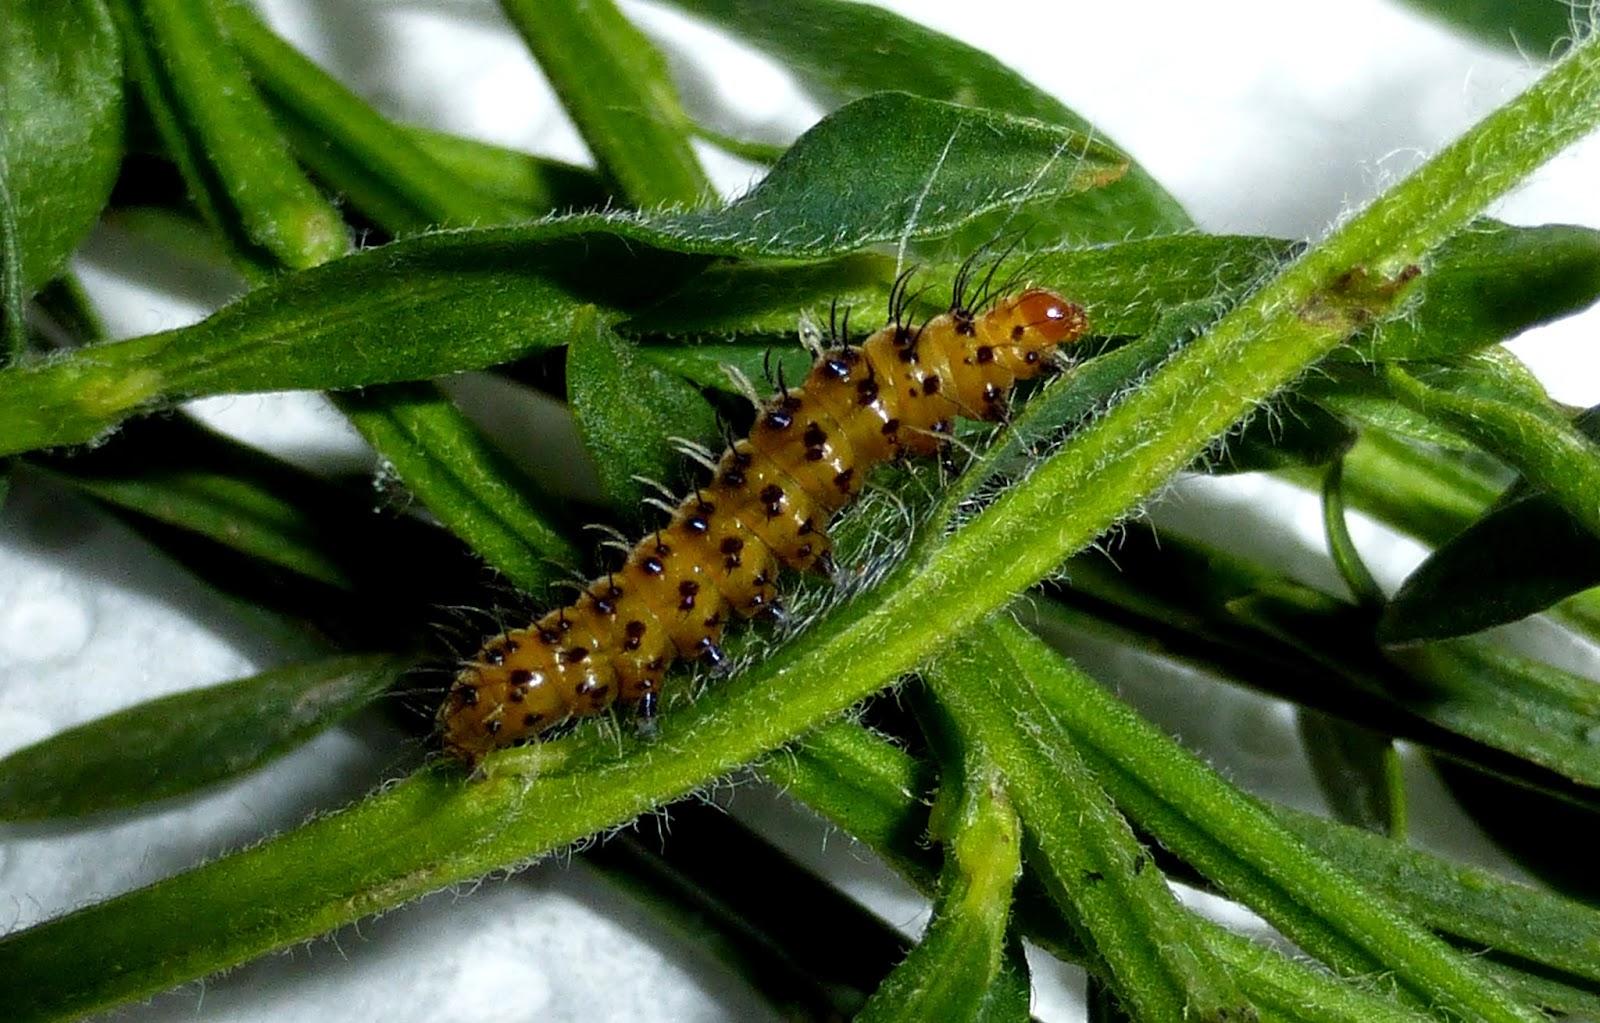 Alytarchia amanda caterpillar